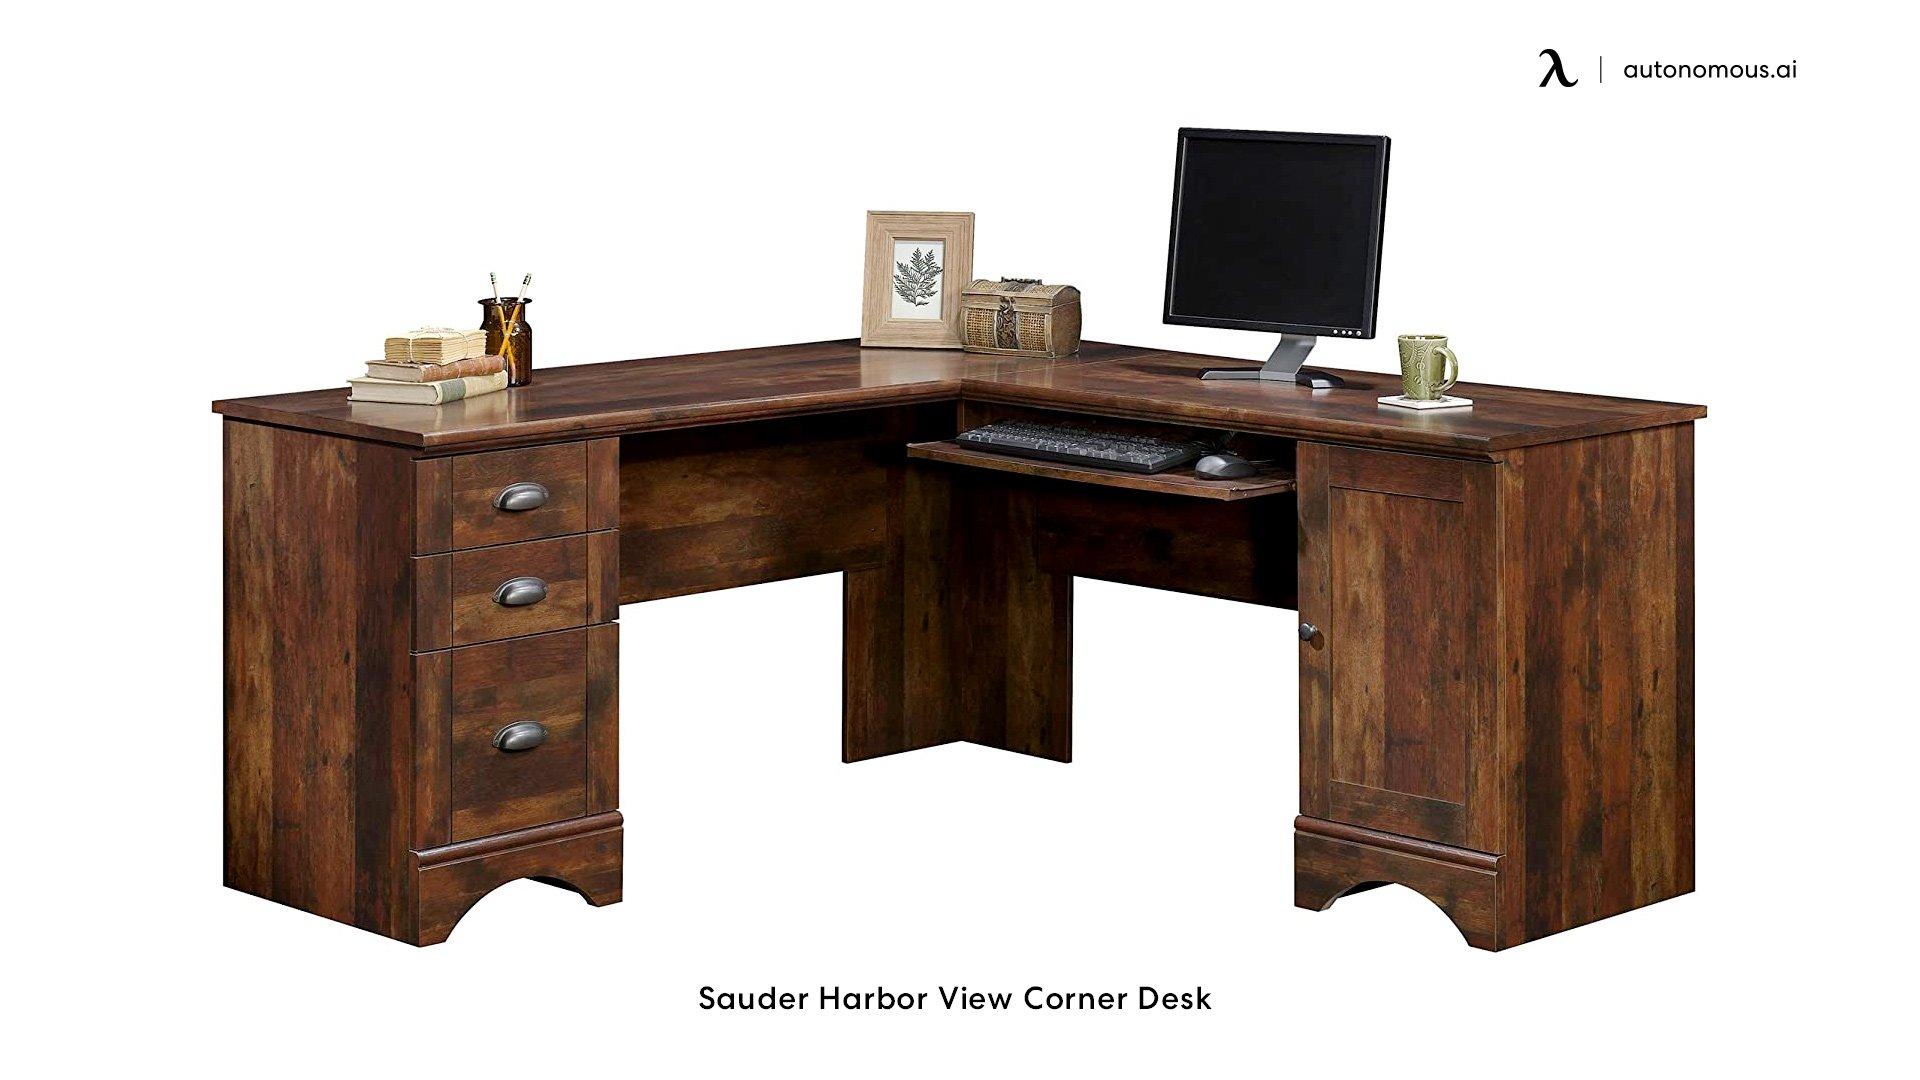 Harbor View Corner Computer Desk by Sauder